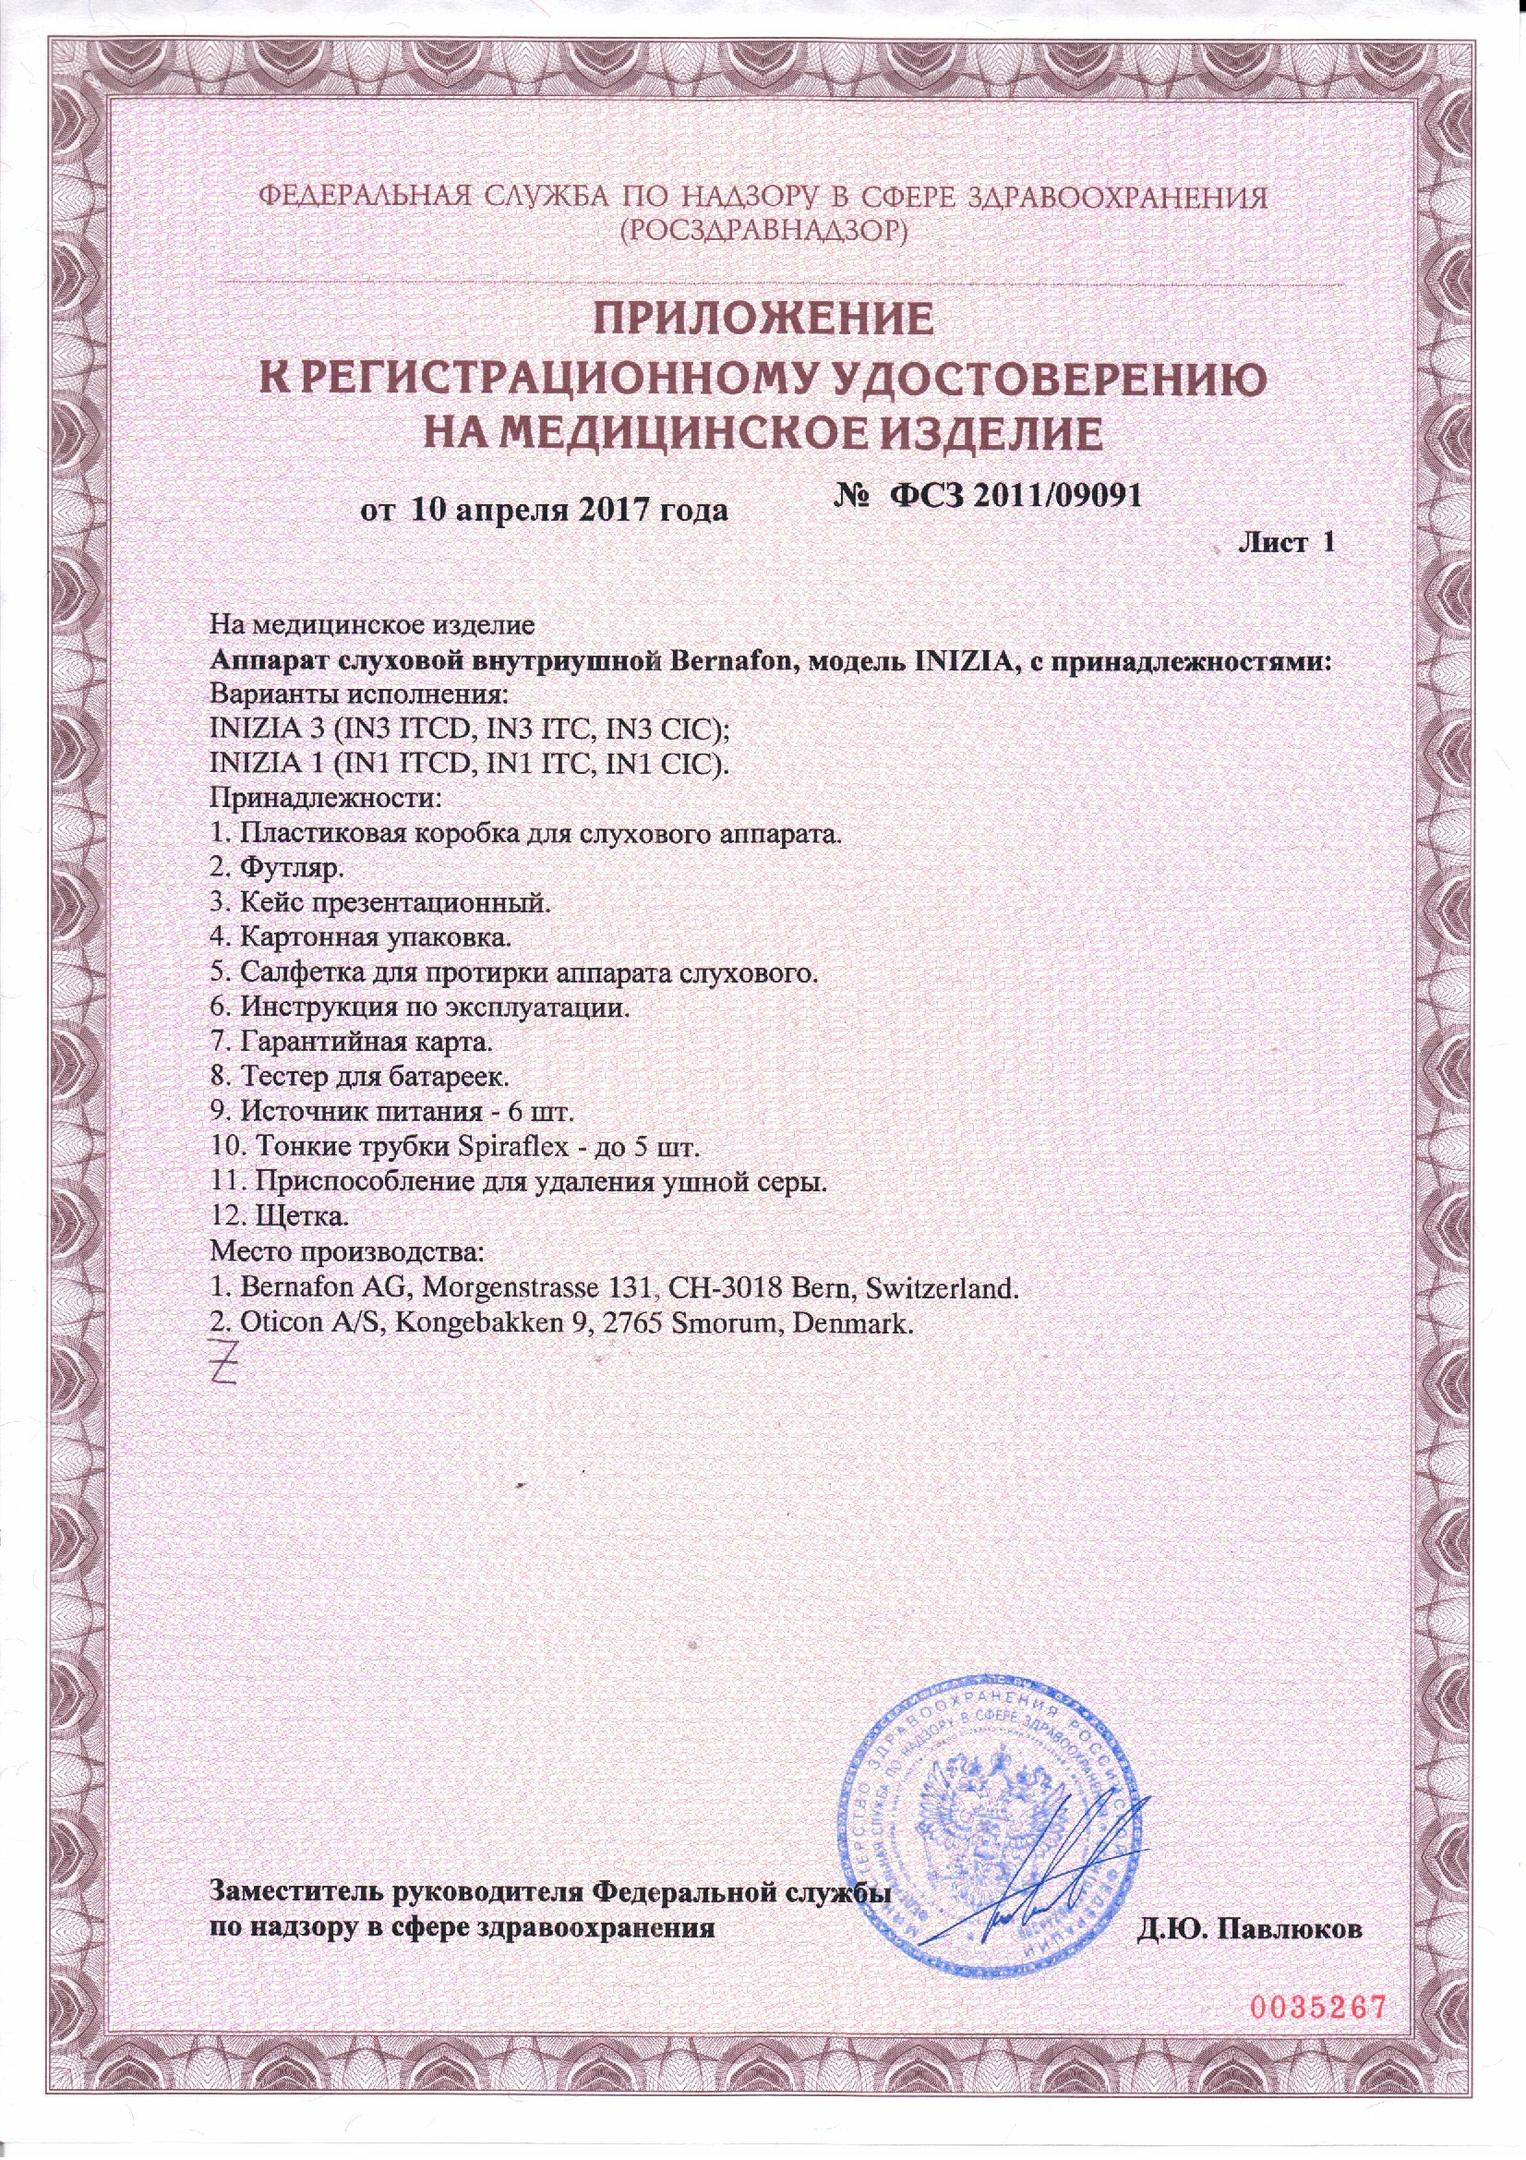 1VrdBCo-X-Y.jpg?size=1526x2160&quality=96&proxy=1&sign=812246d8934467c702f0d74752b8852a&type=album